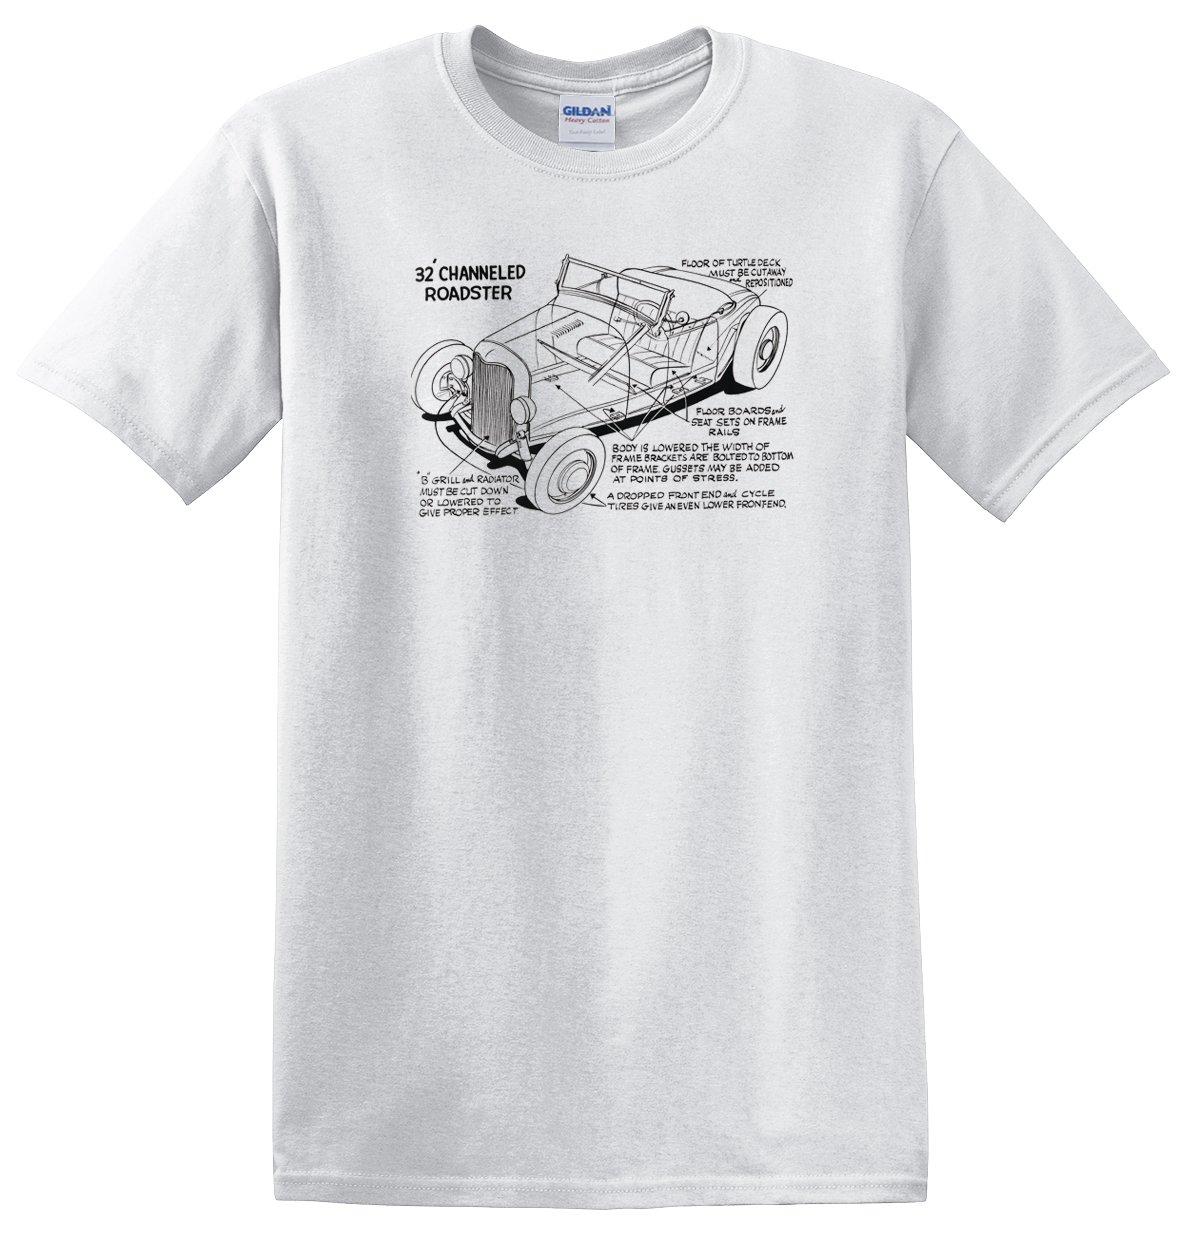 Channeled '32 Roadster Cutaway T-shirt